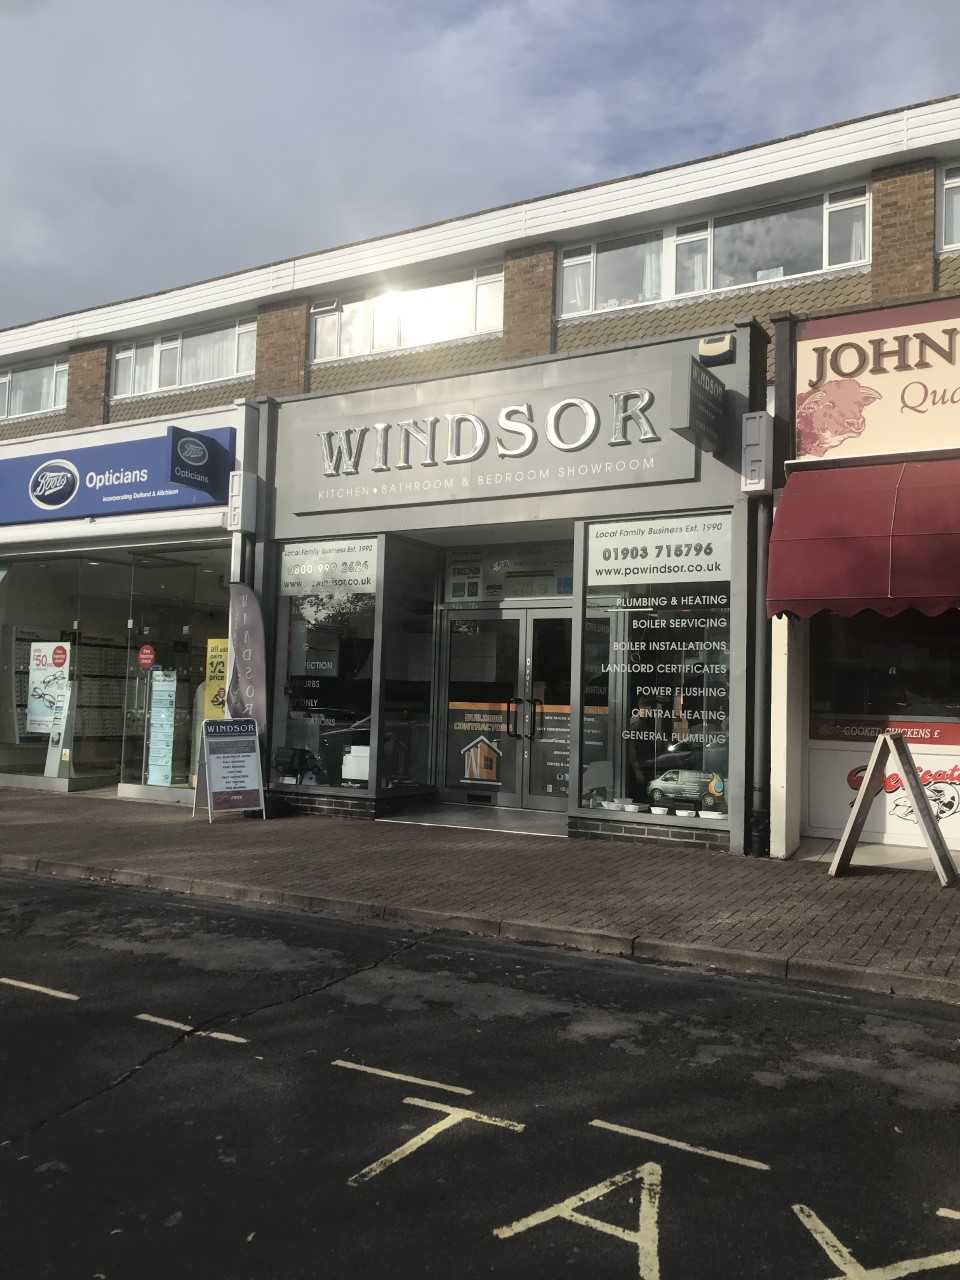 P A Windsors LTD in Rustington (1)